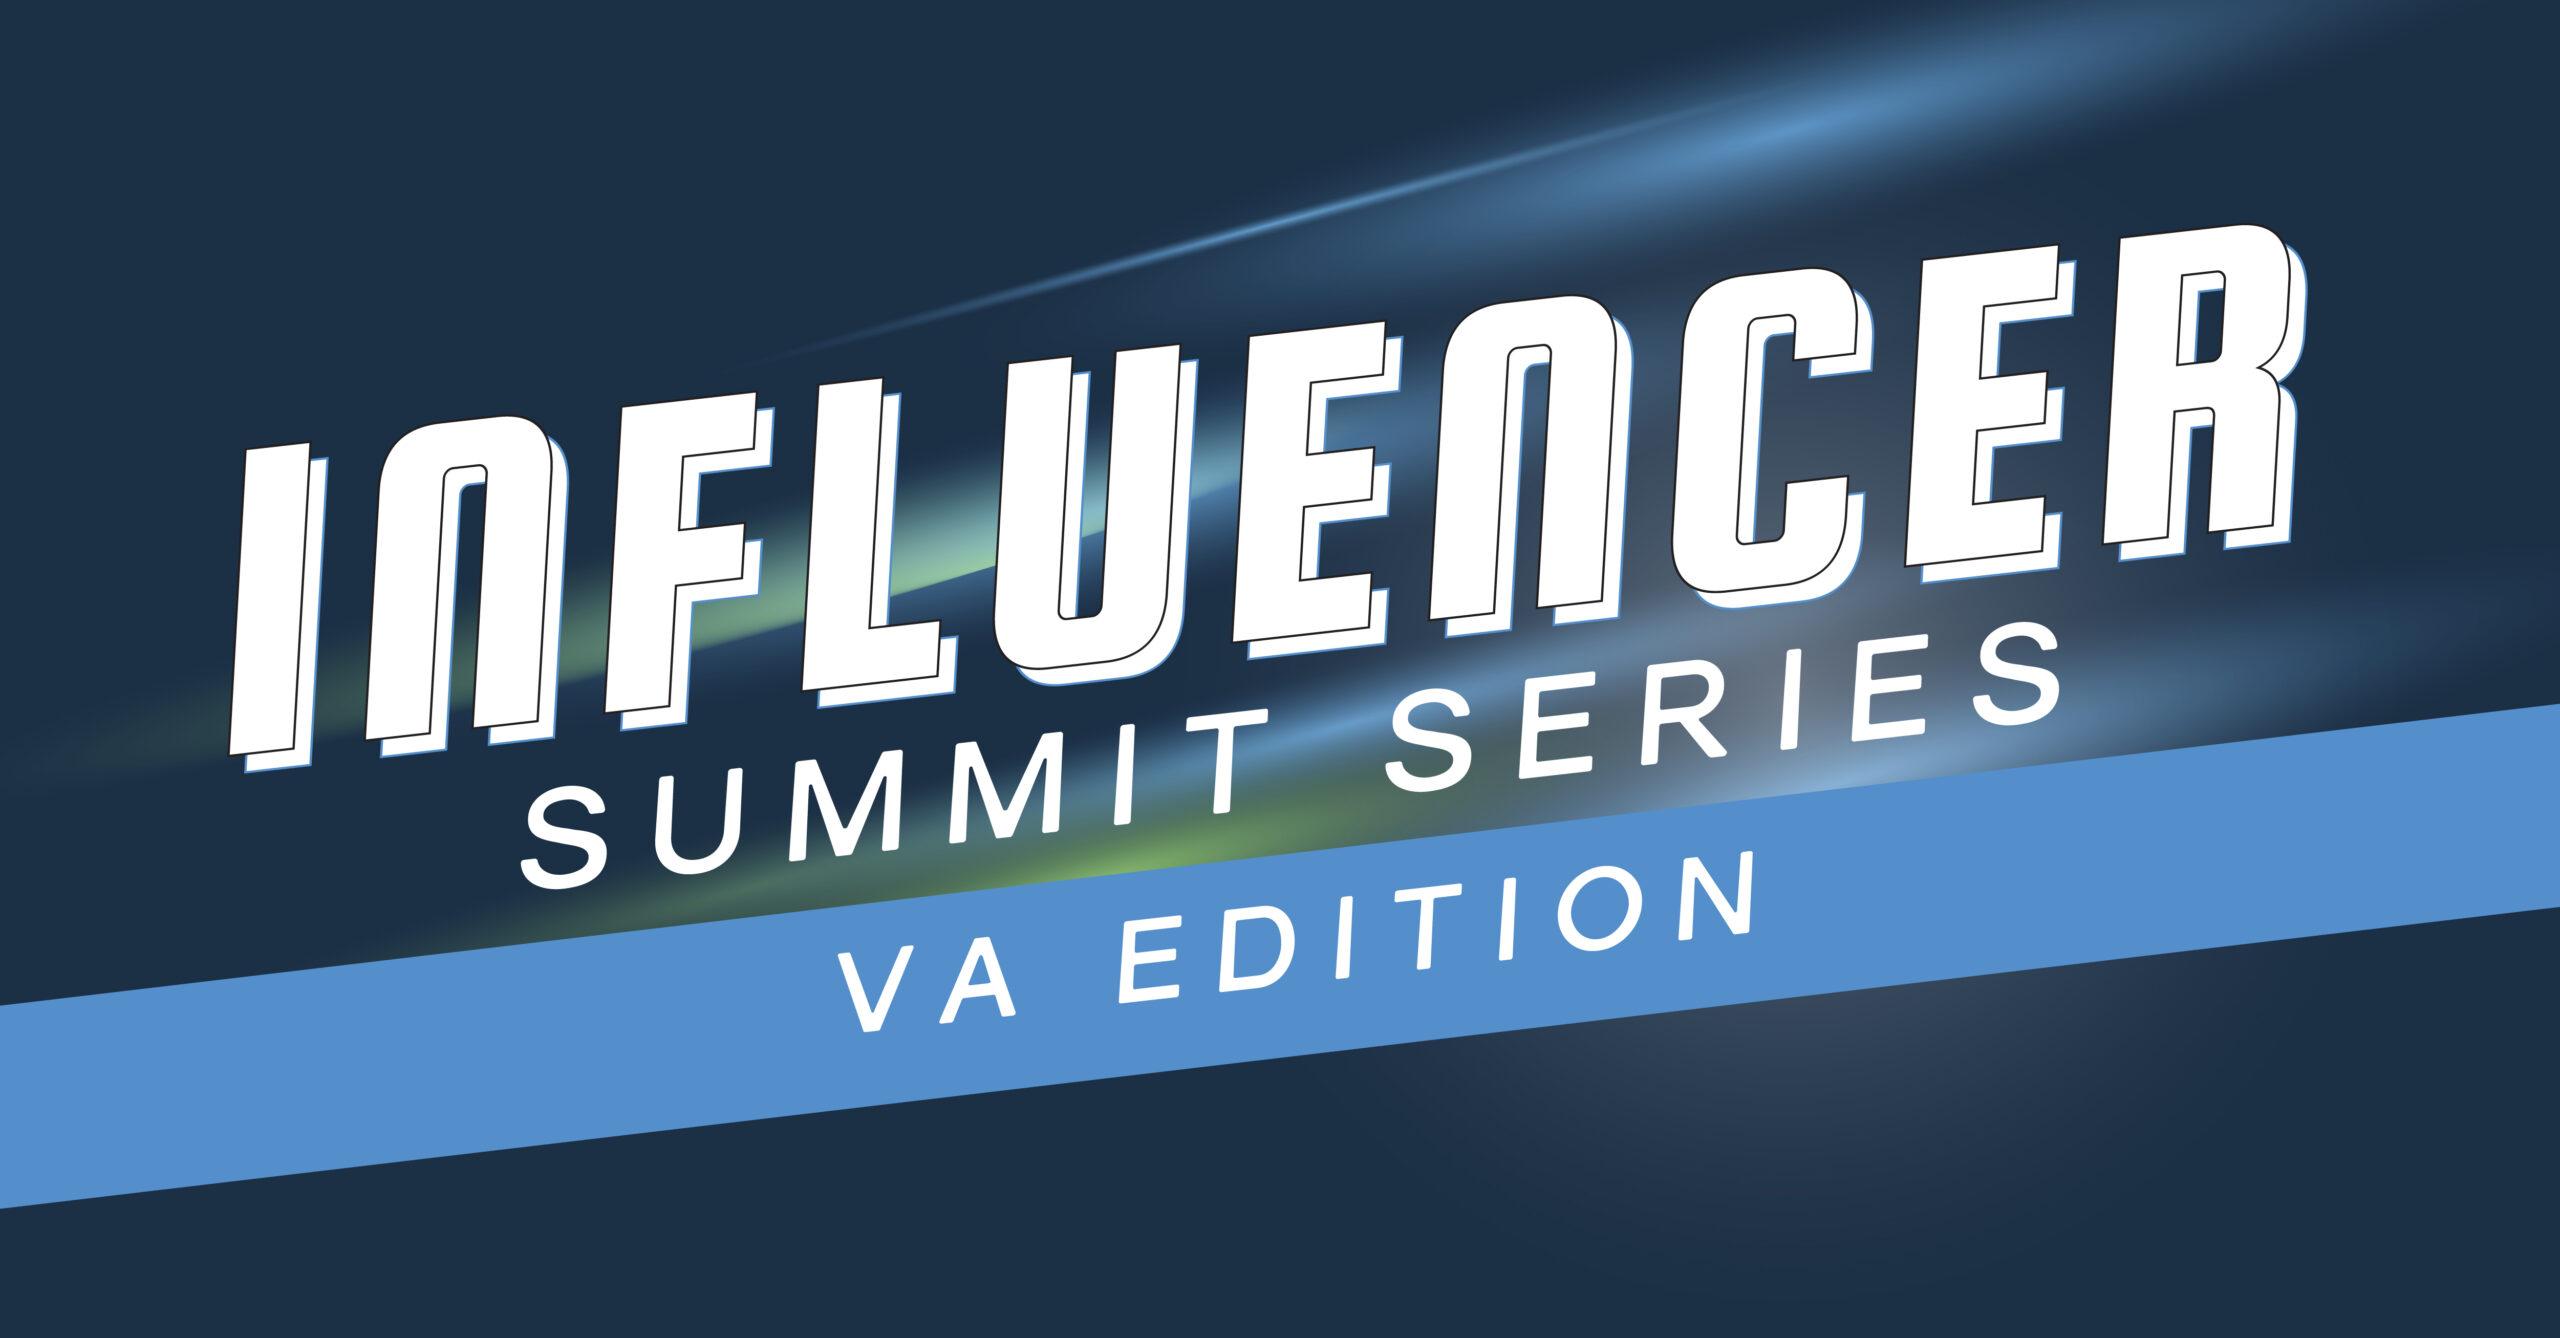 VA-Summit-Influencer-Speaker-Image-3